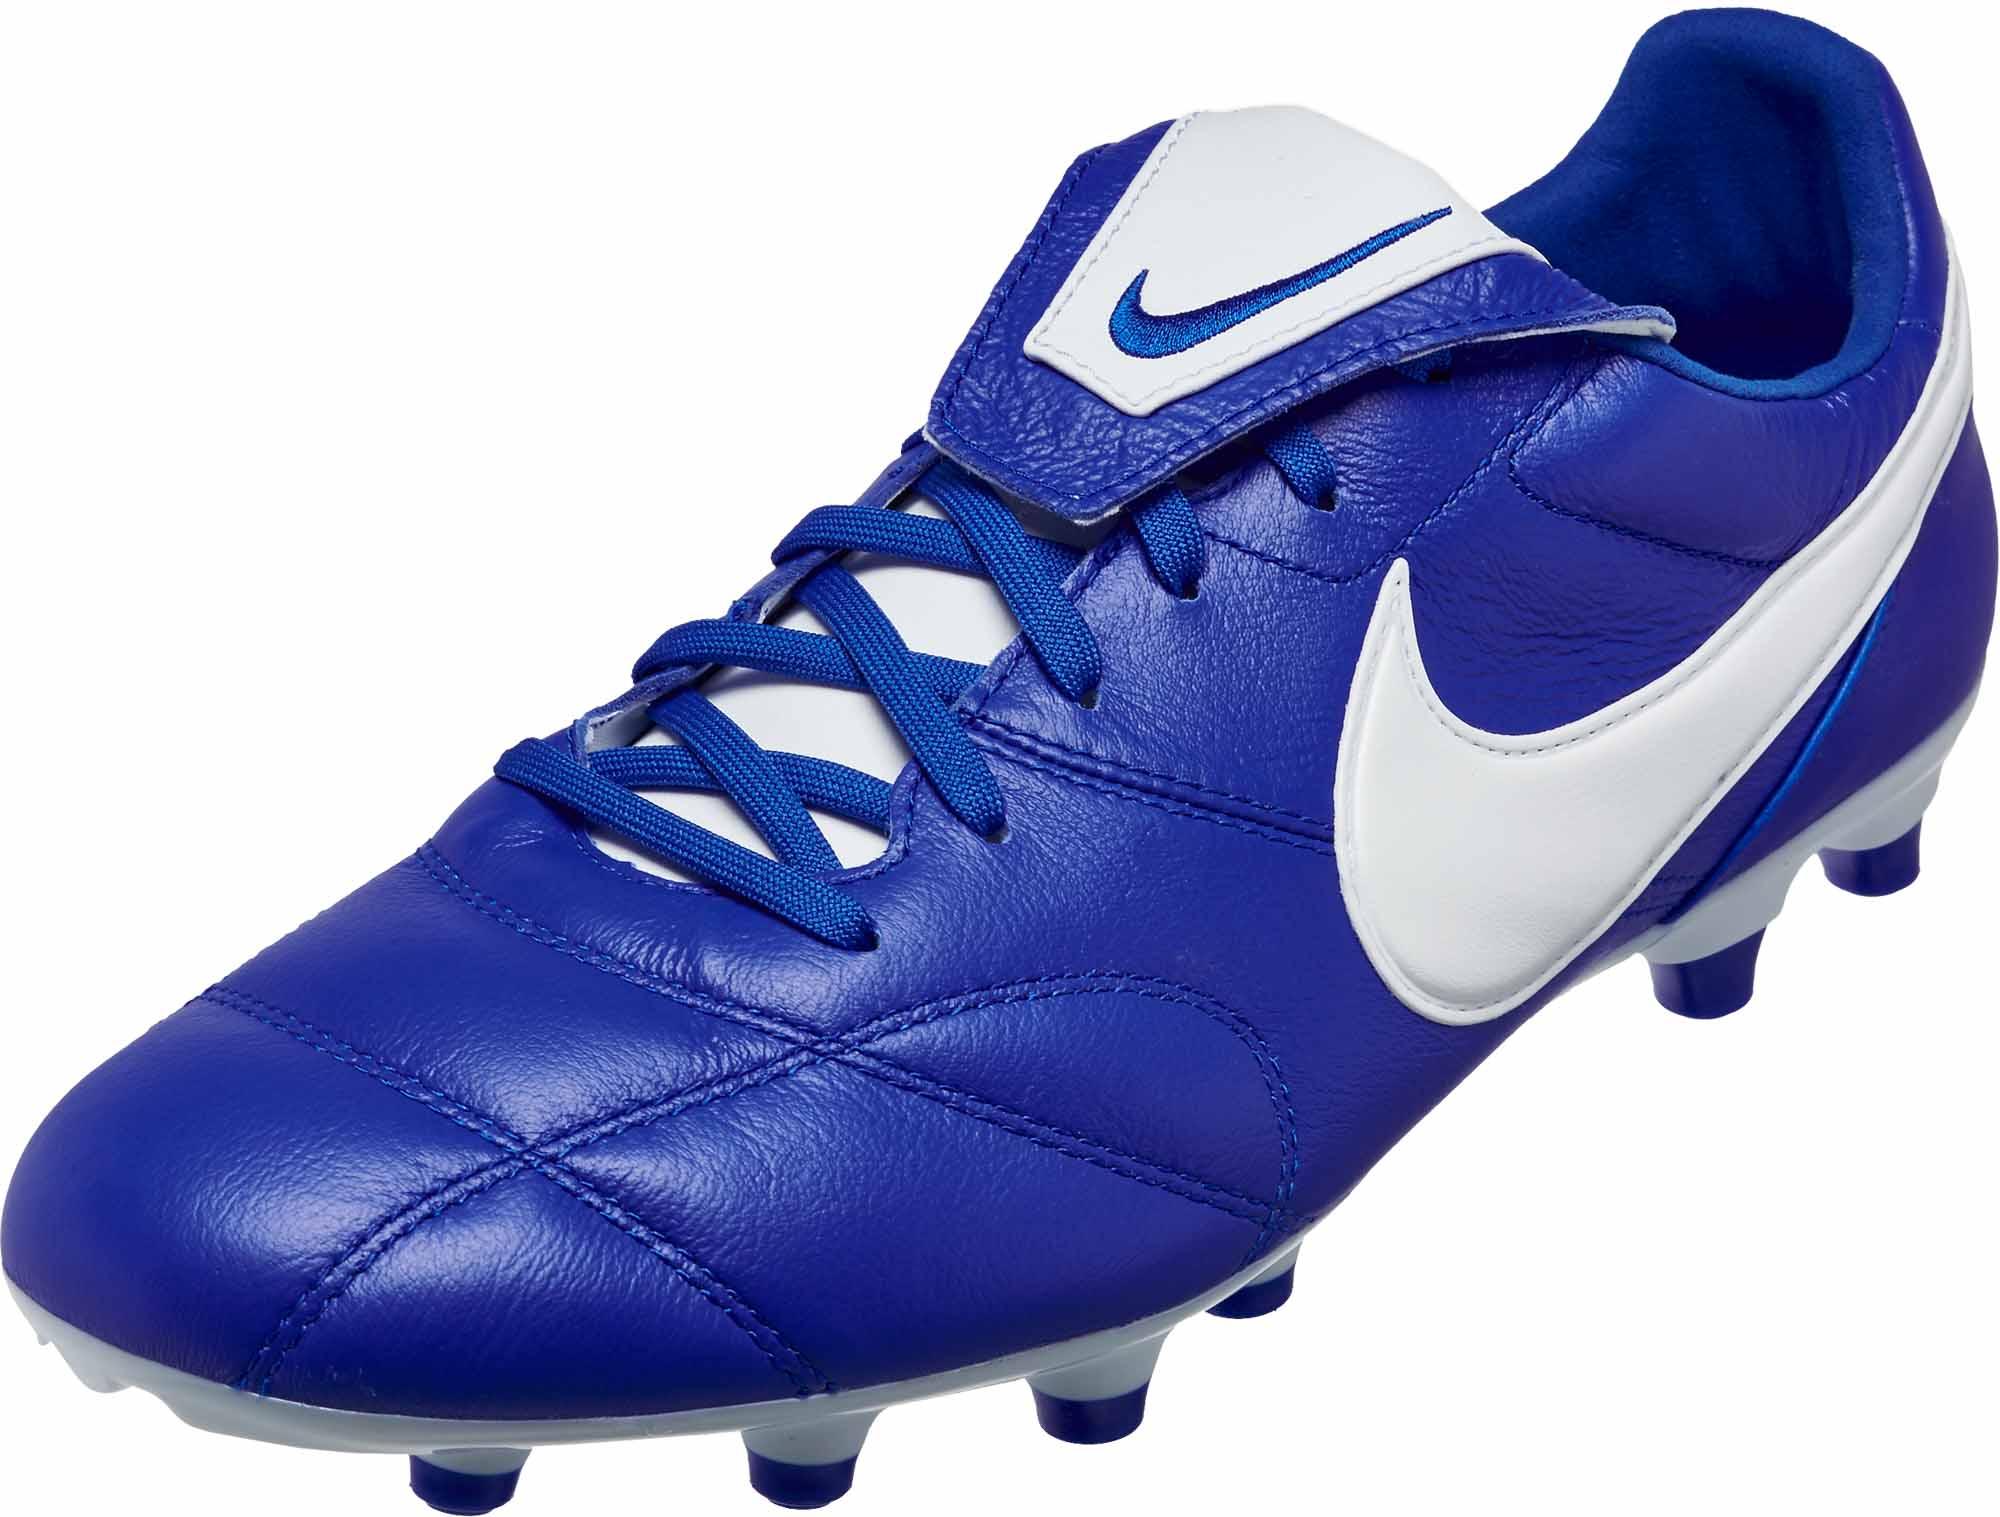 4820ee91e The Nike Premier II FG – Race Blue/White